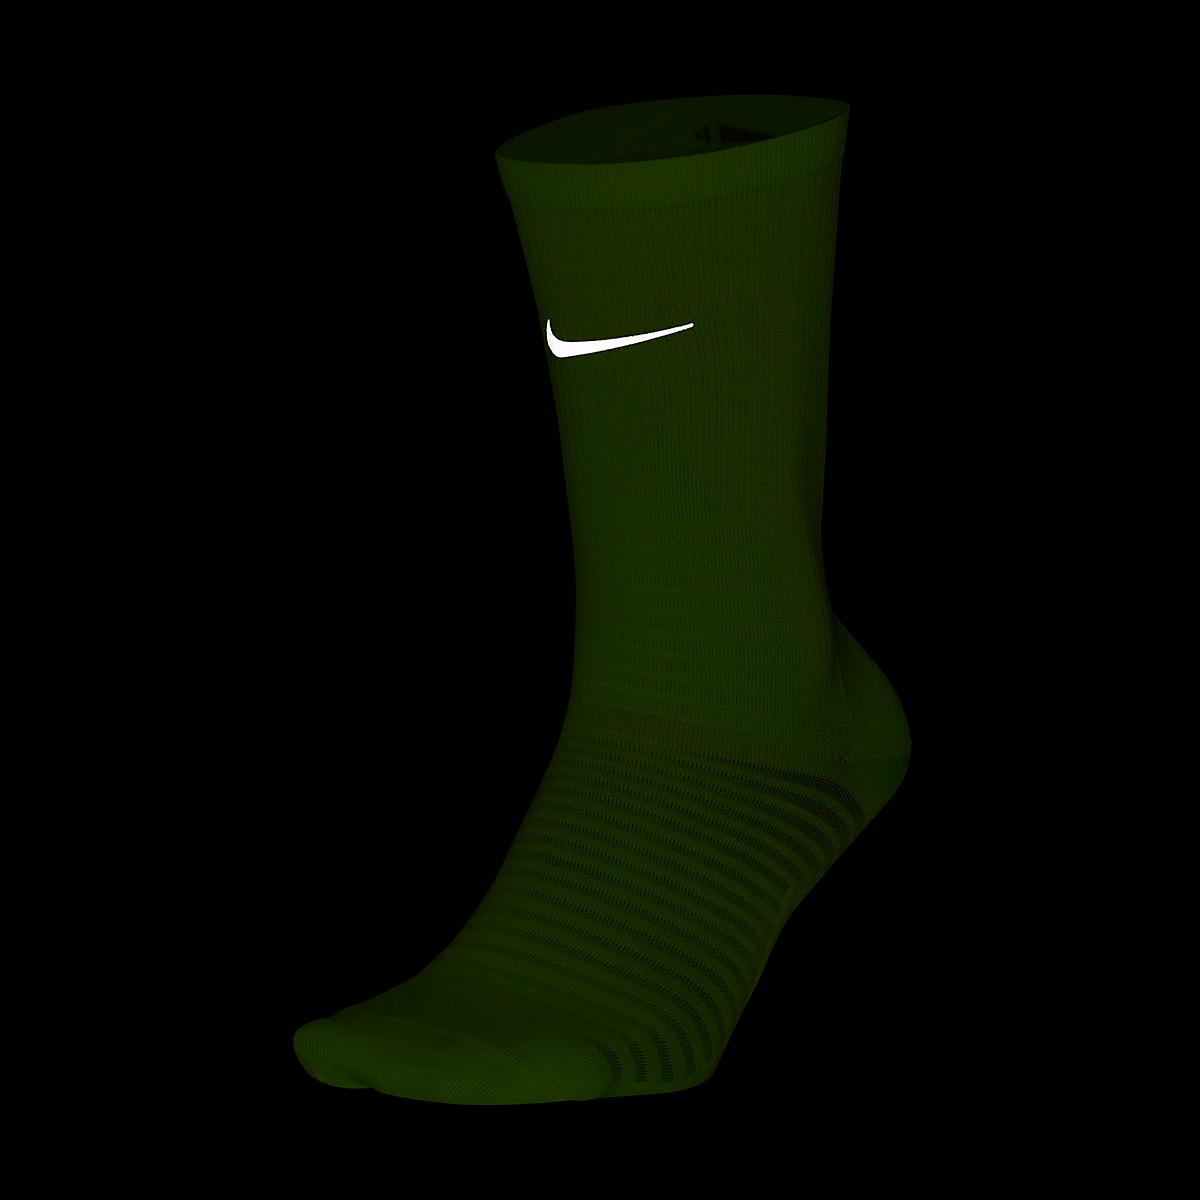 Nike Spark Lightweight Crew Running Socks, , large, image 3